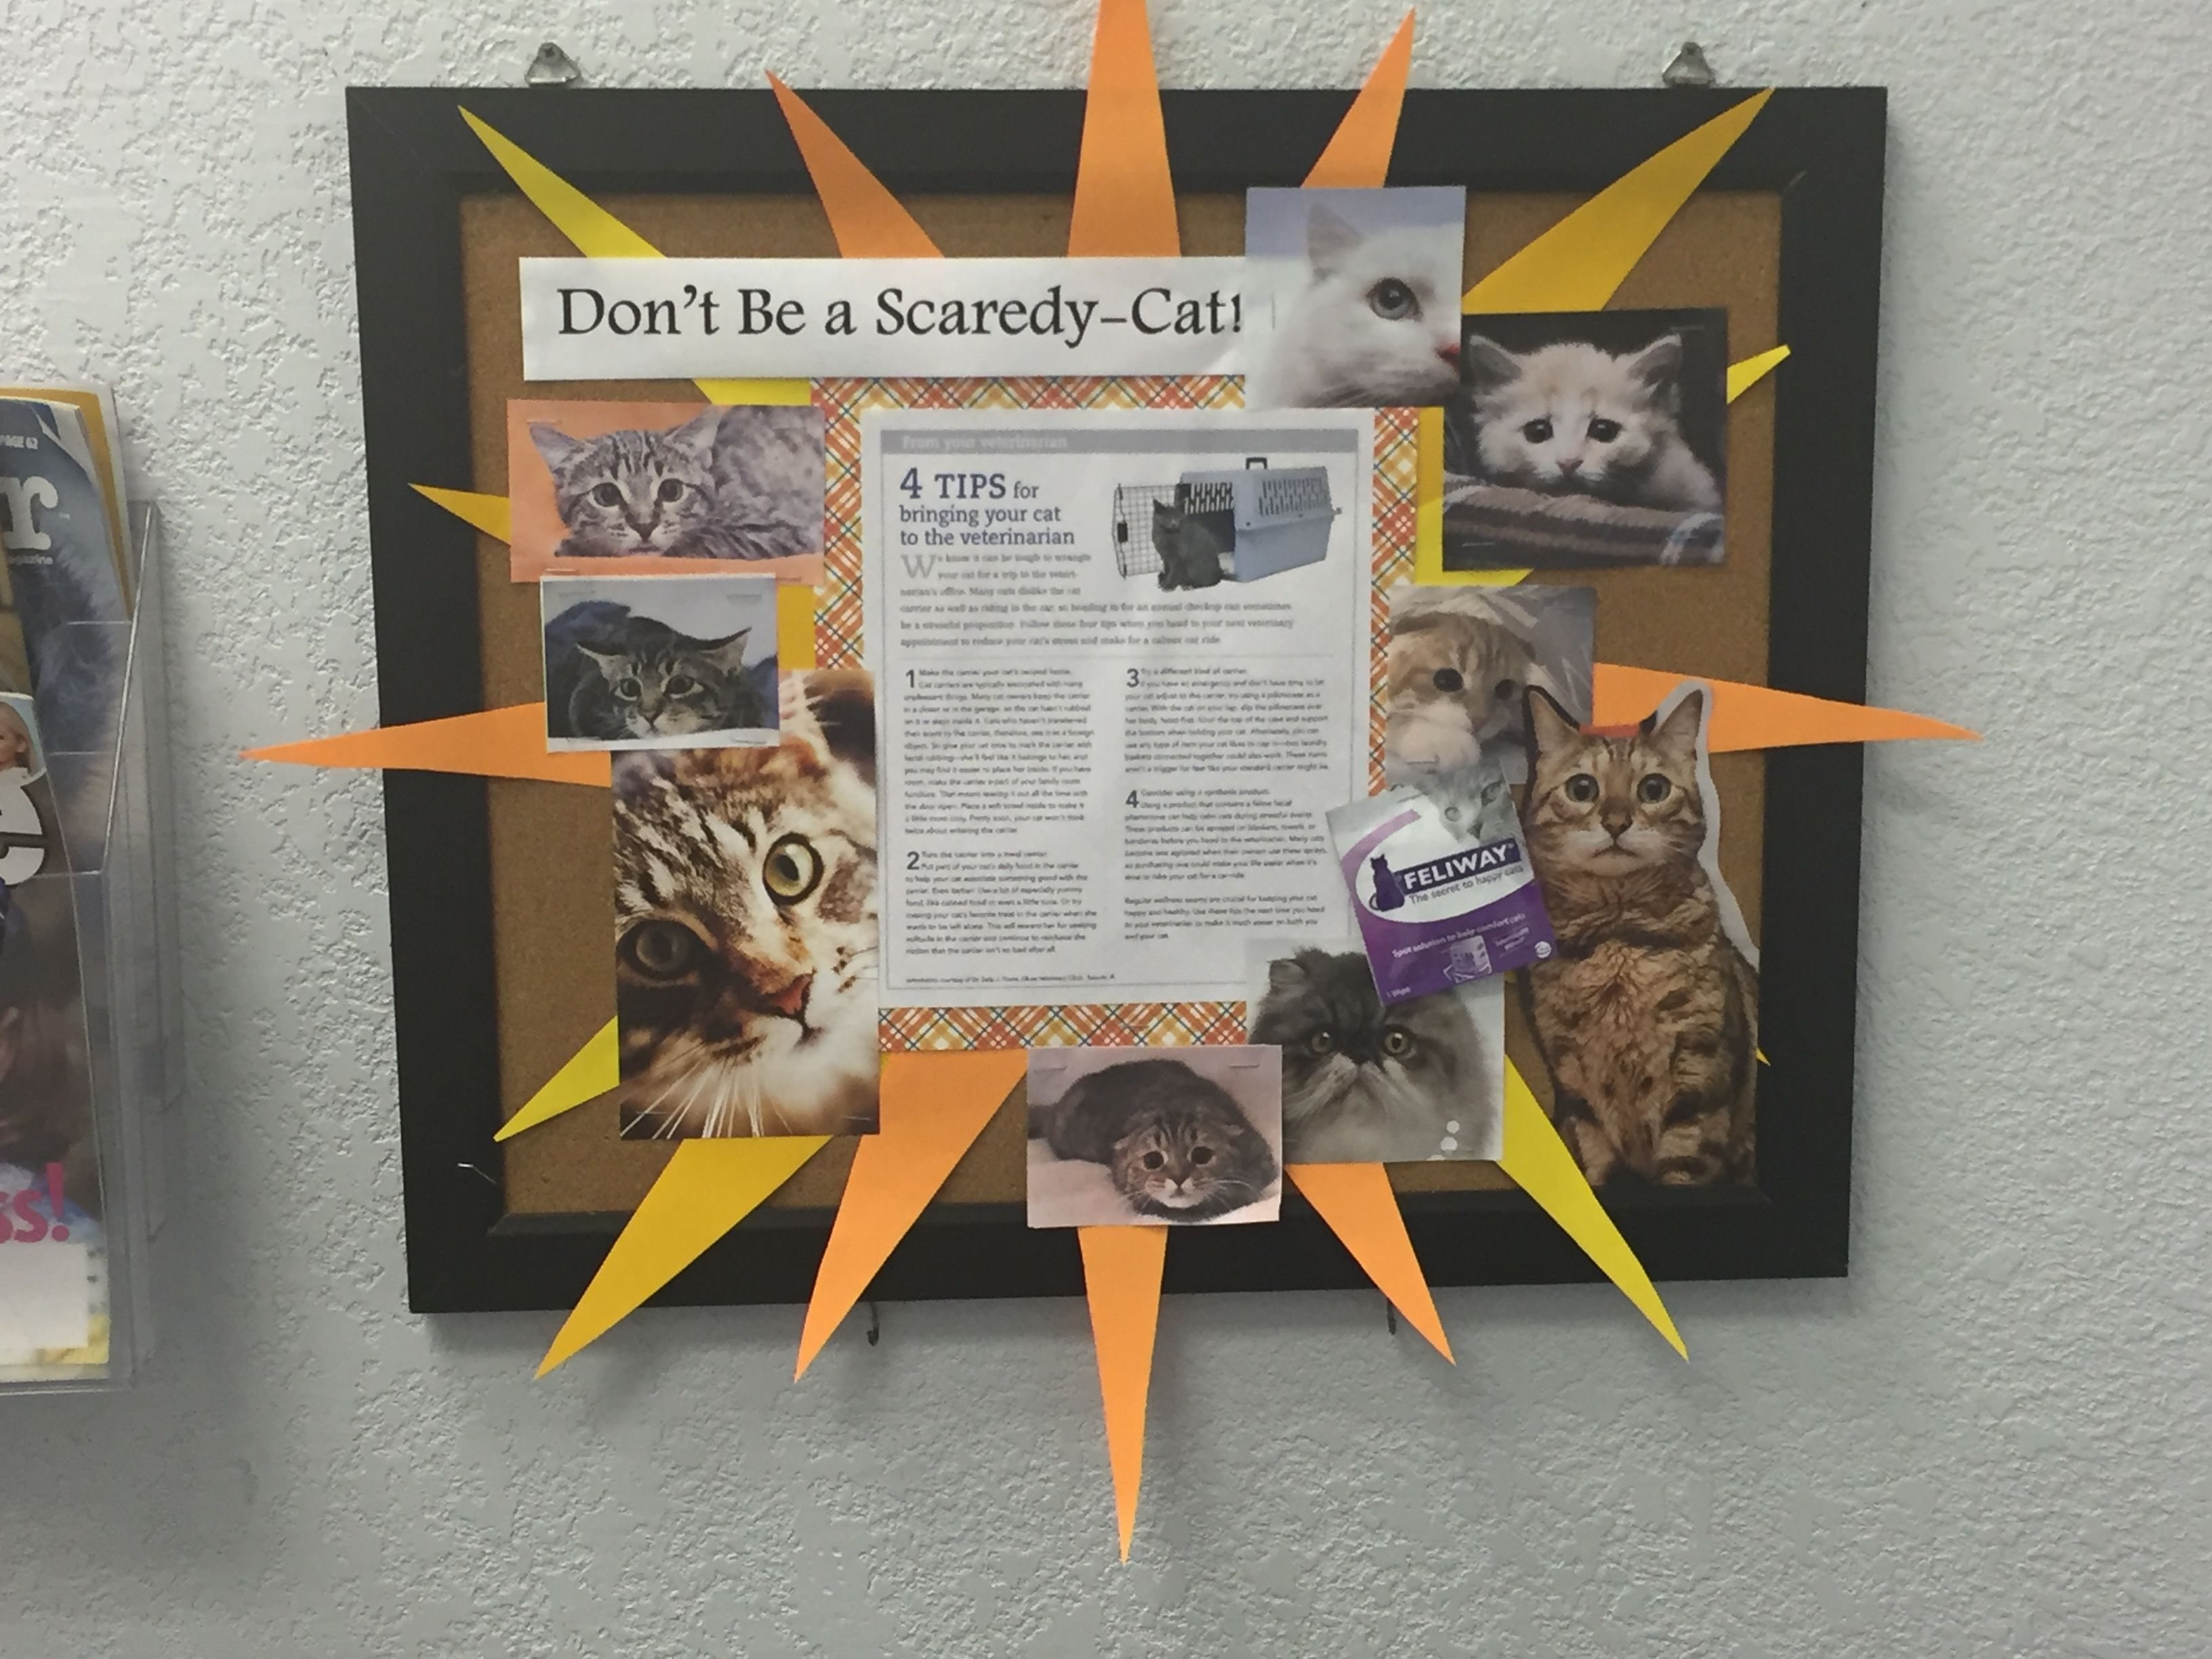 Fighting Fear Cats Vet Clinics Veterinary Tech Veterinary Hospital